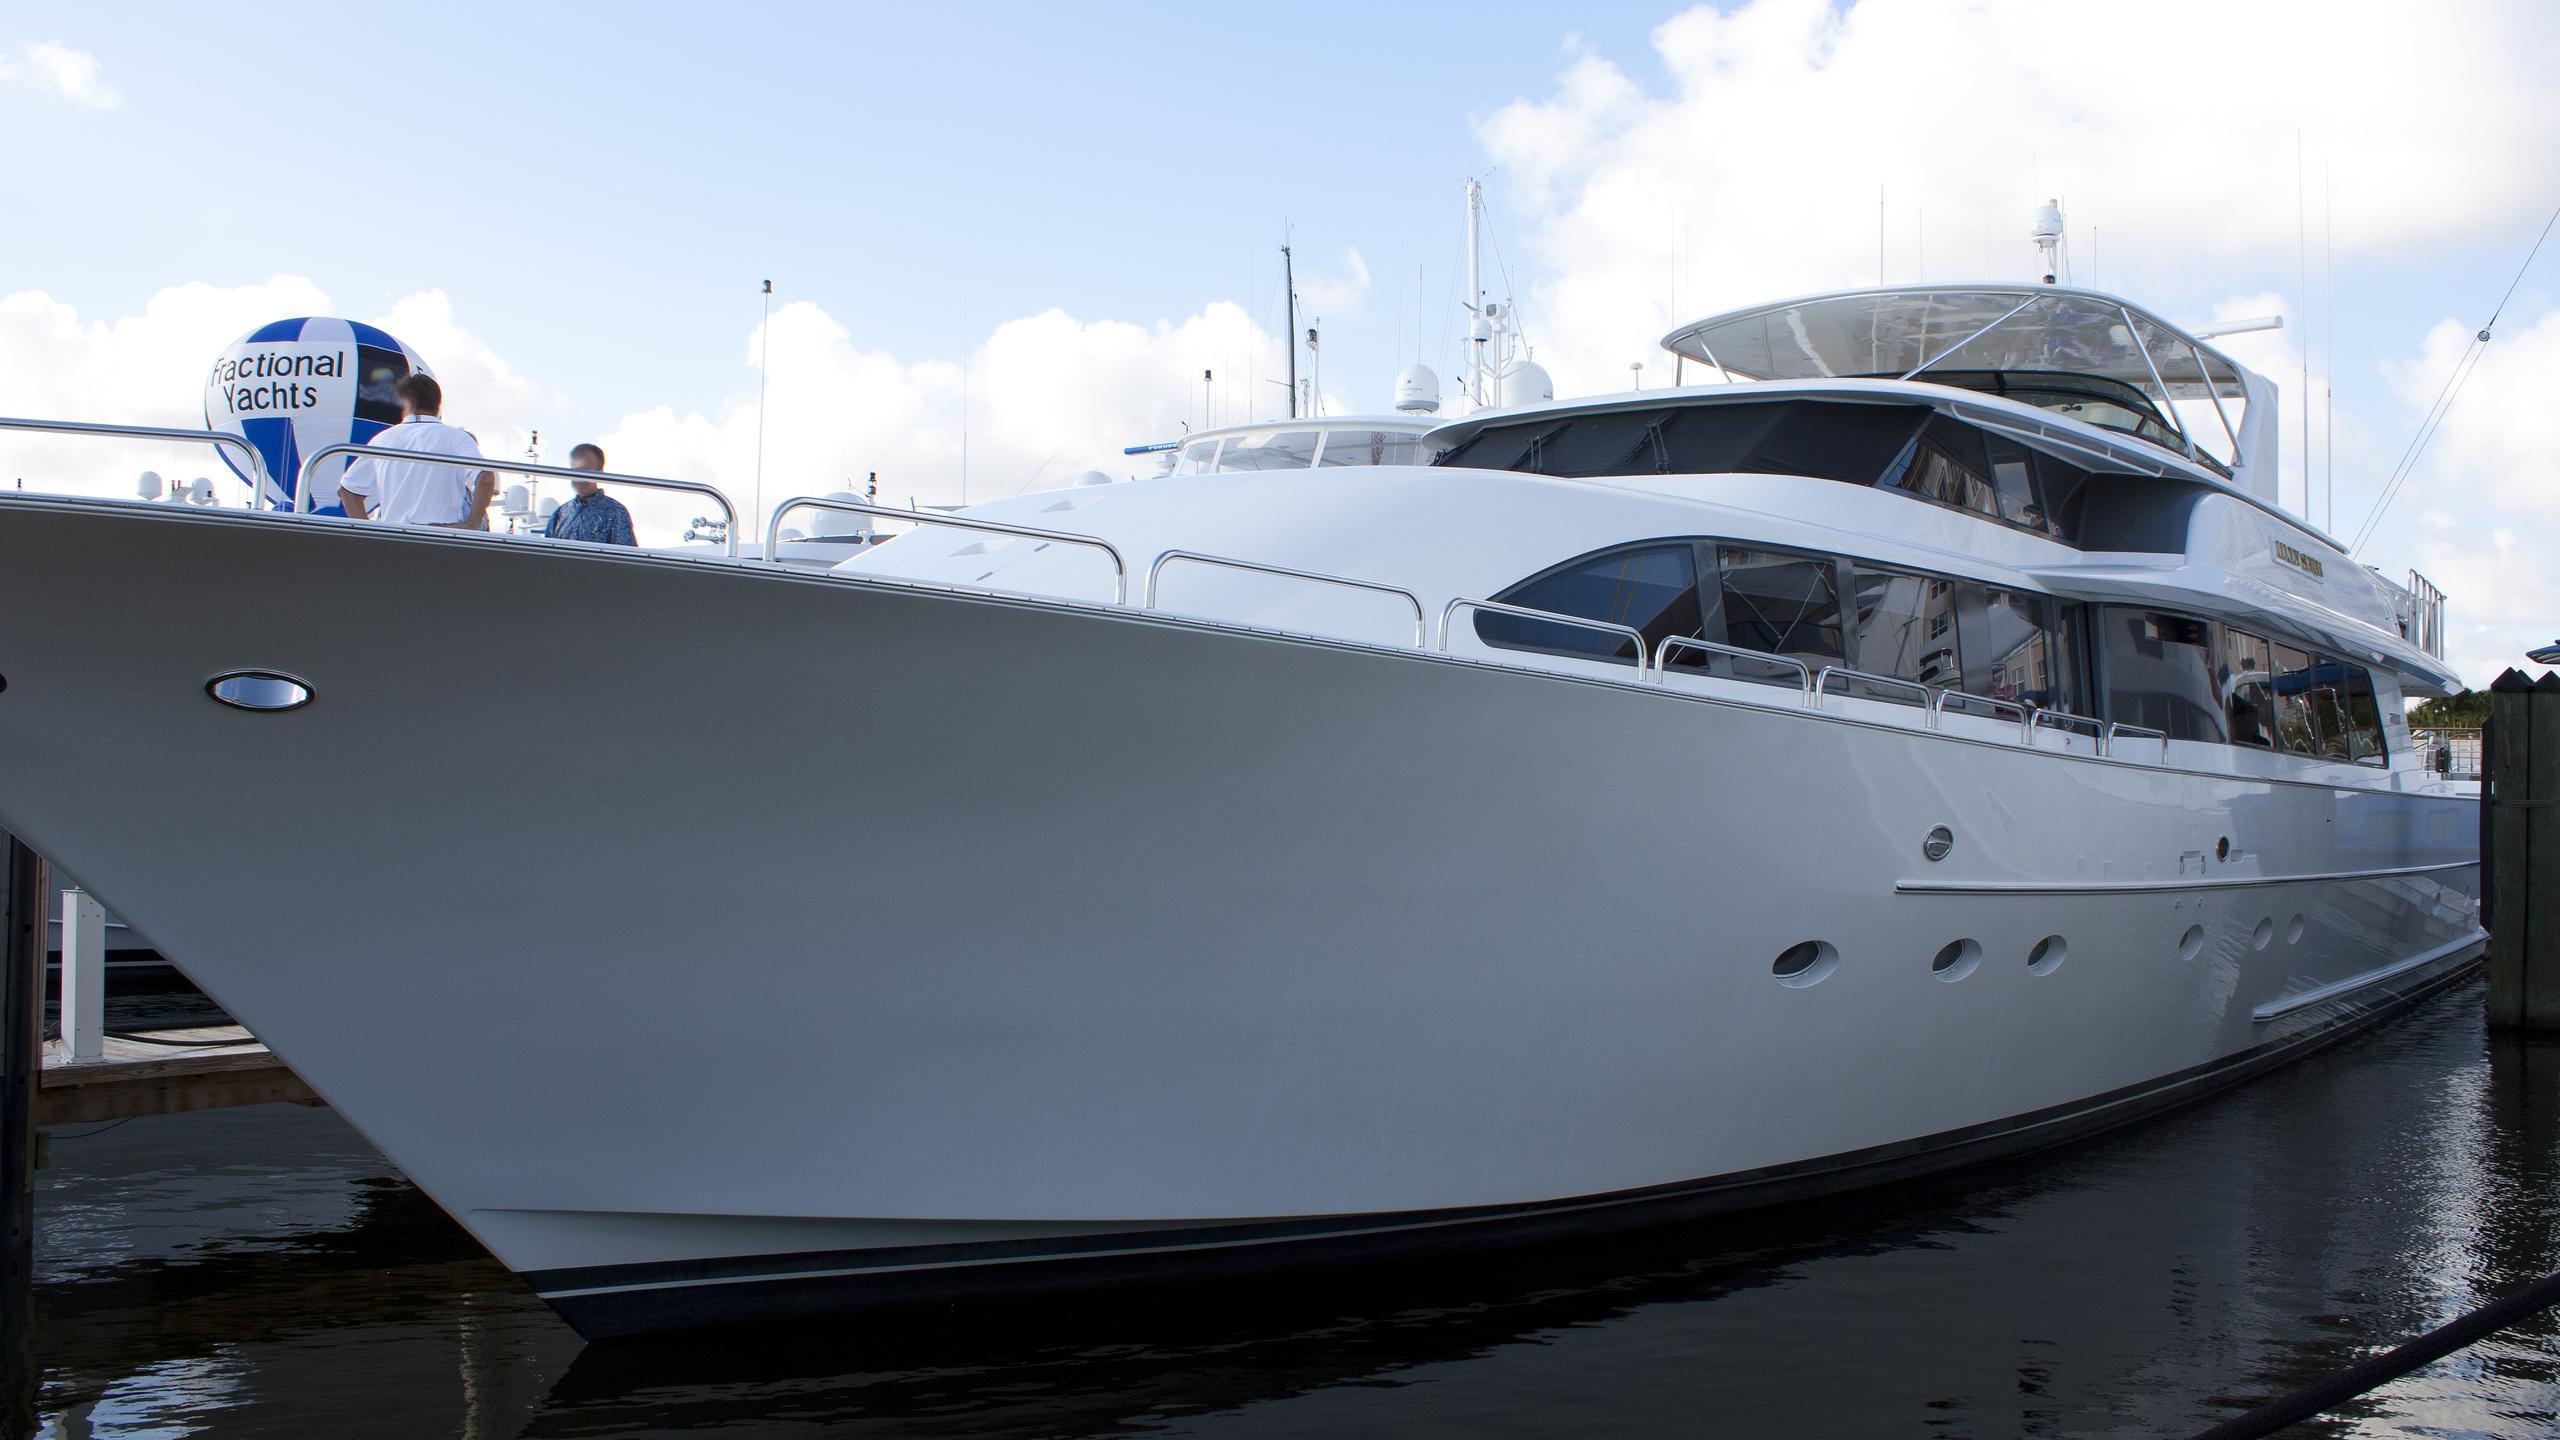 wendy-i-joans-ark-motor-yacht-westport-2001-34m-front-profile